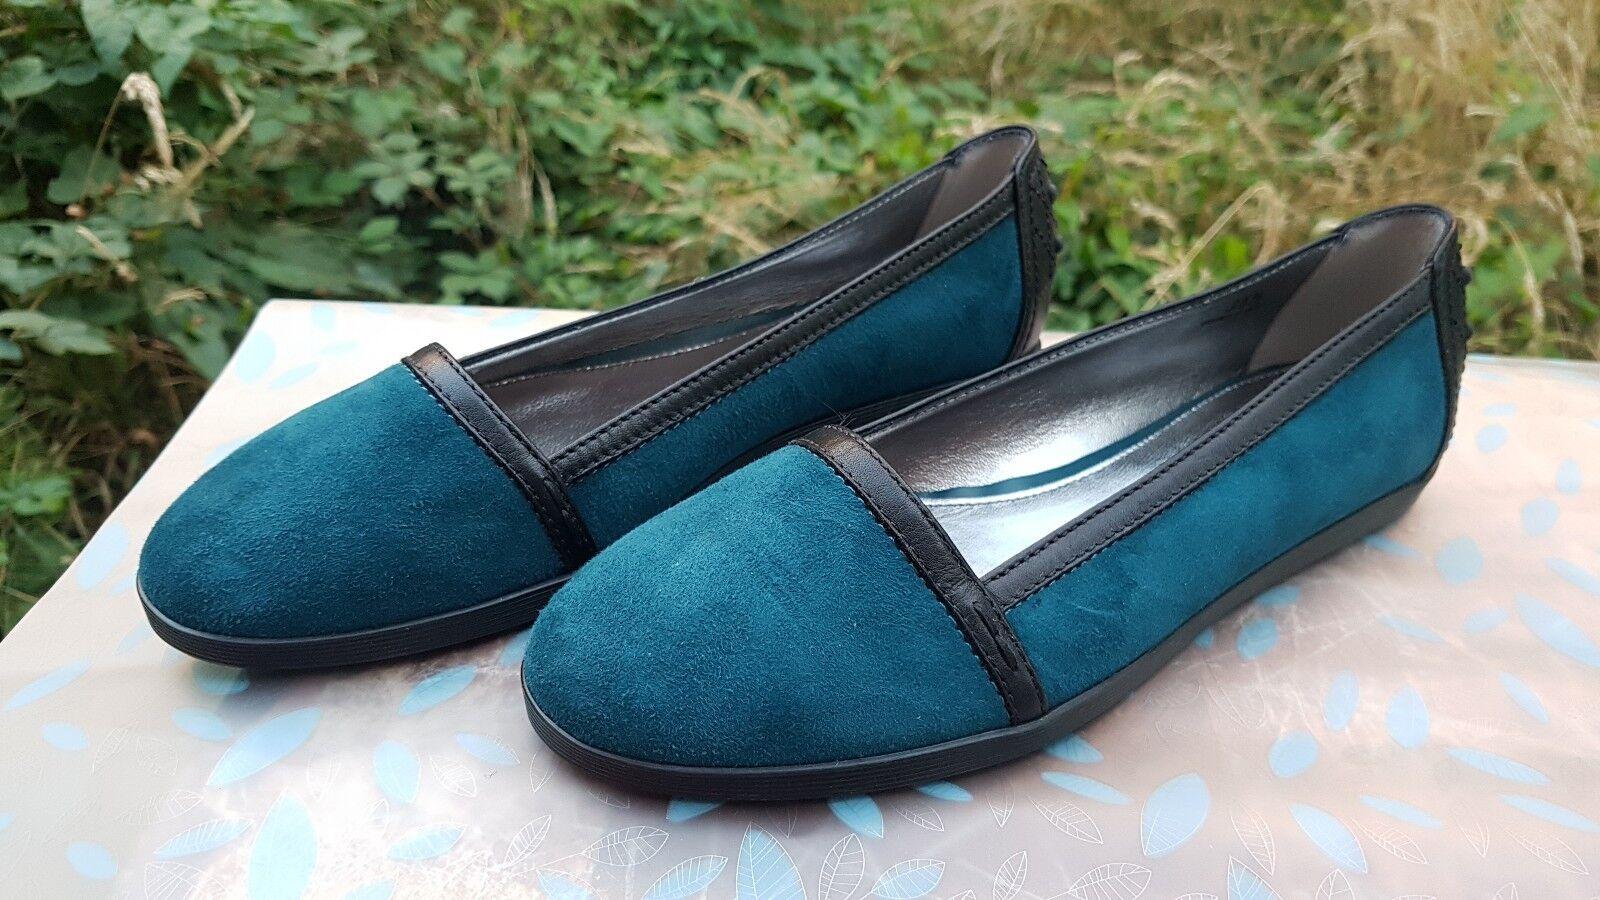 Tods Womens Flats Suede & Leather Petrol bluee & Black Black Black UK 3.5 EUR 35.5 Italian 864e66